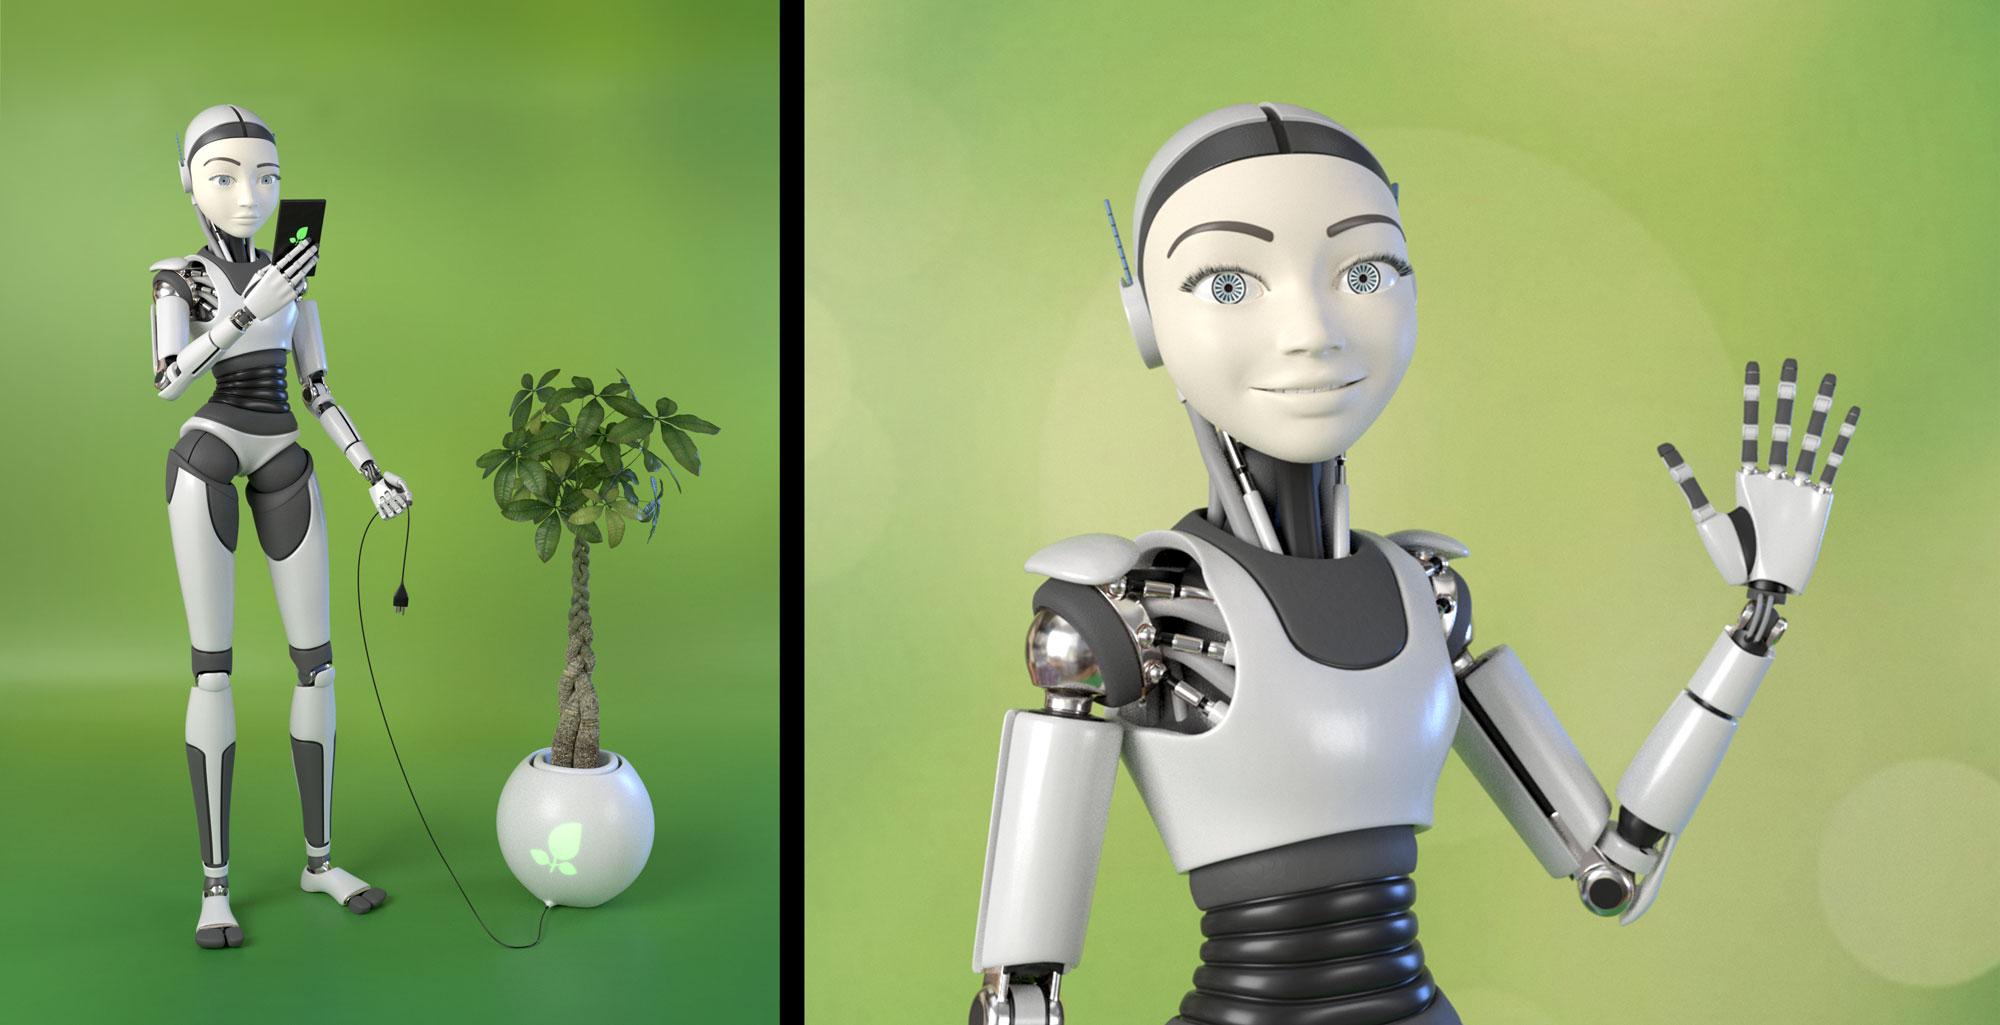 RobotVert